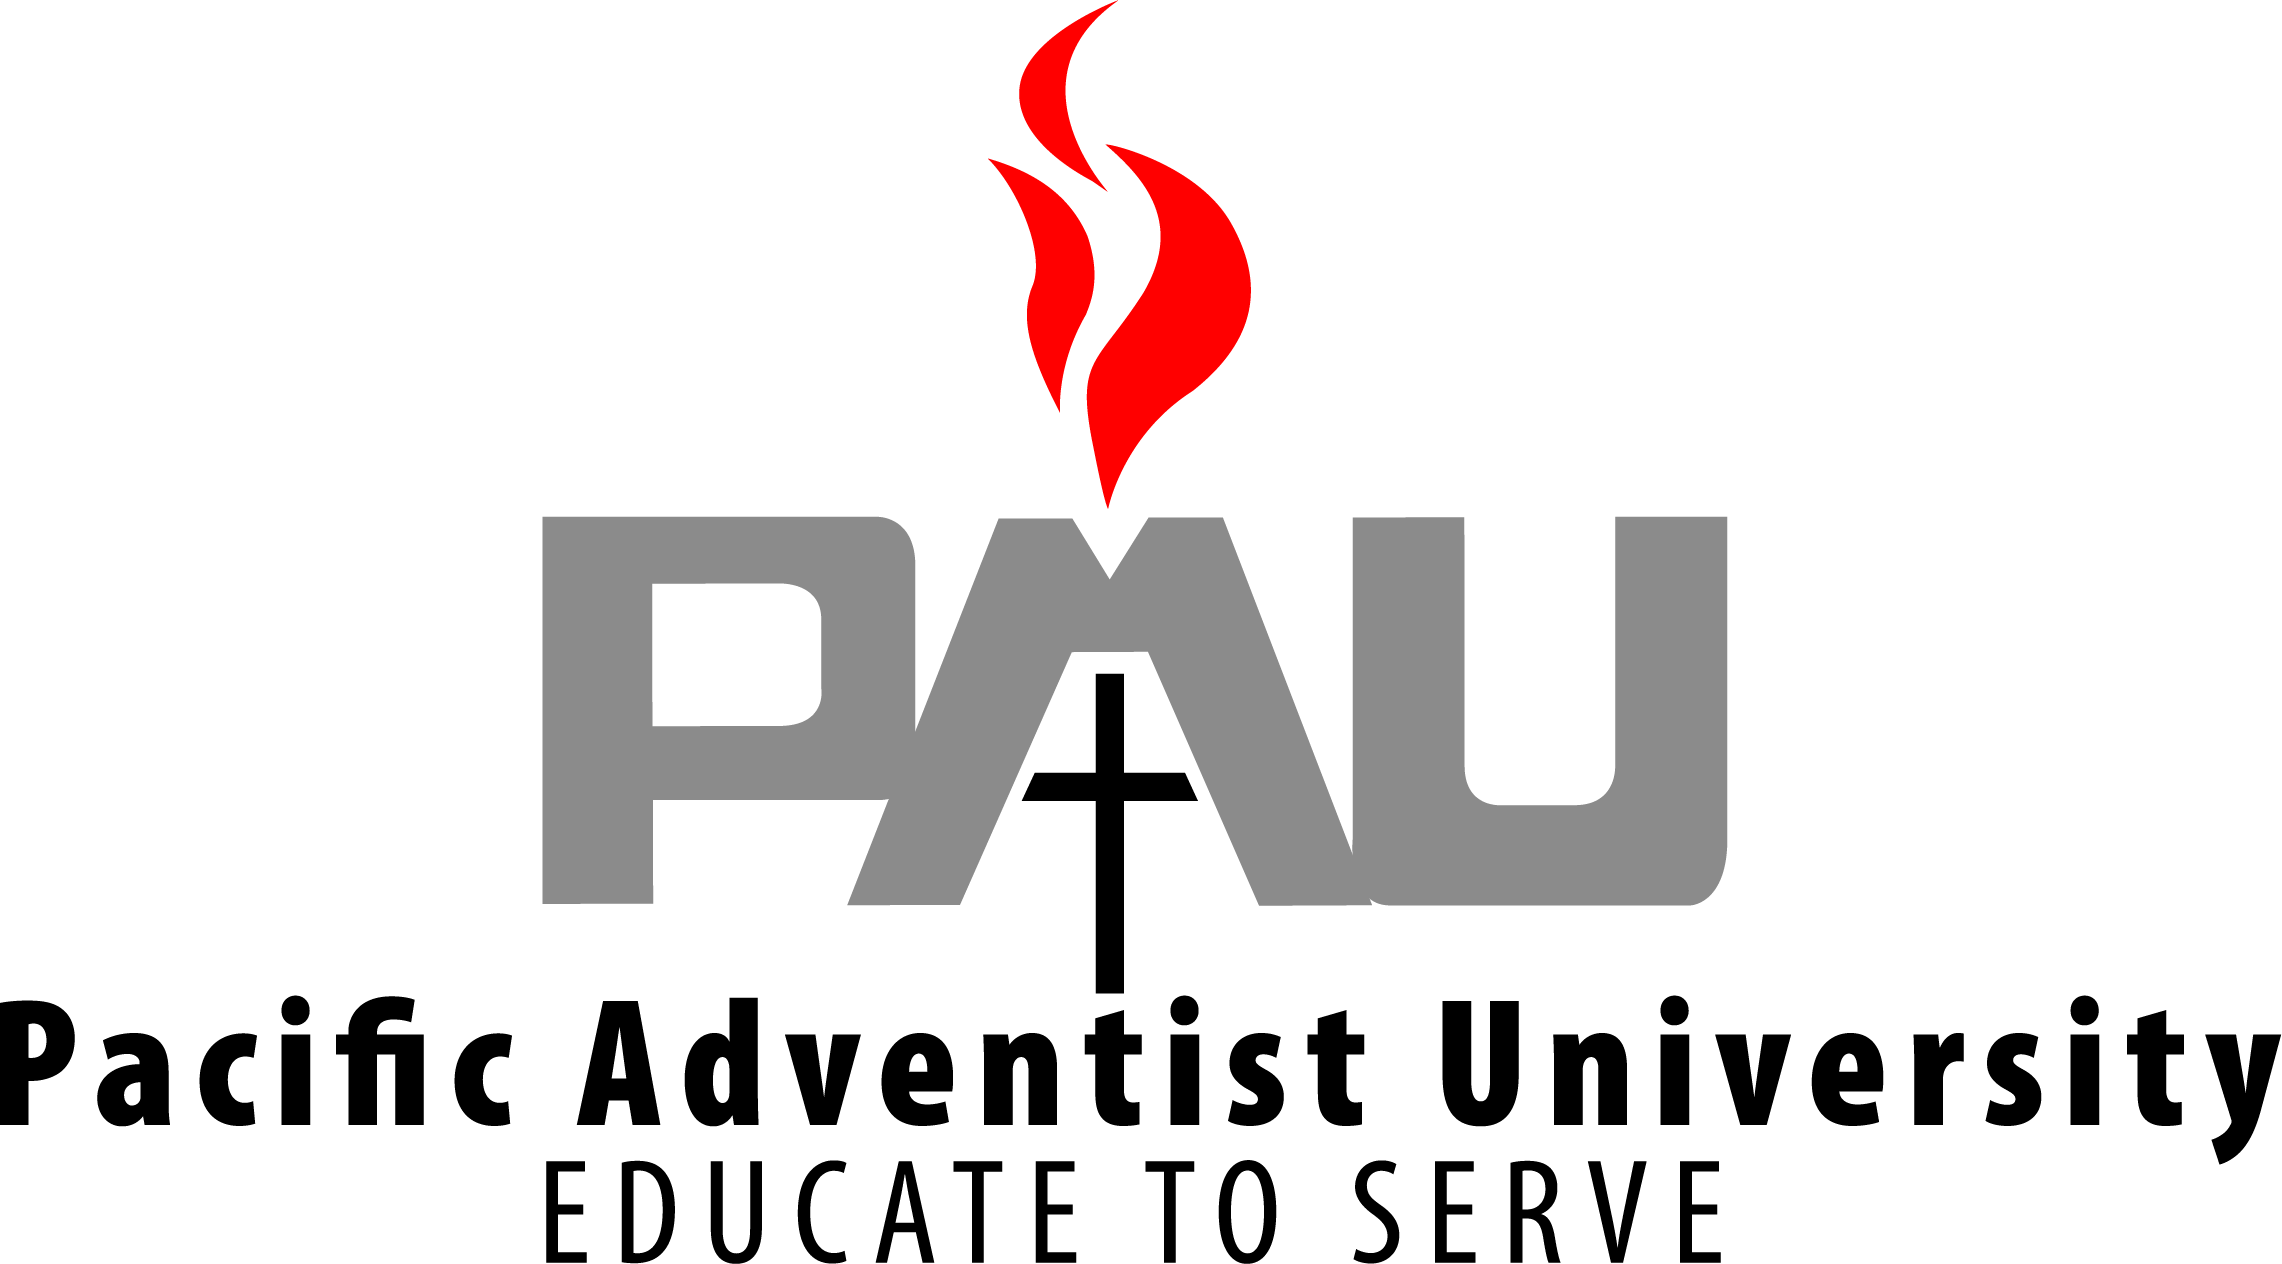 Pacific Adventist University logo